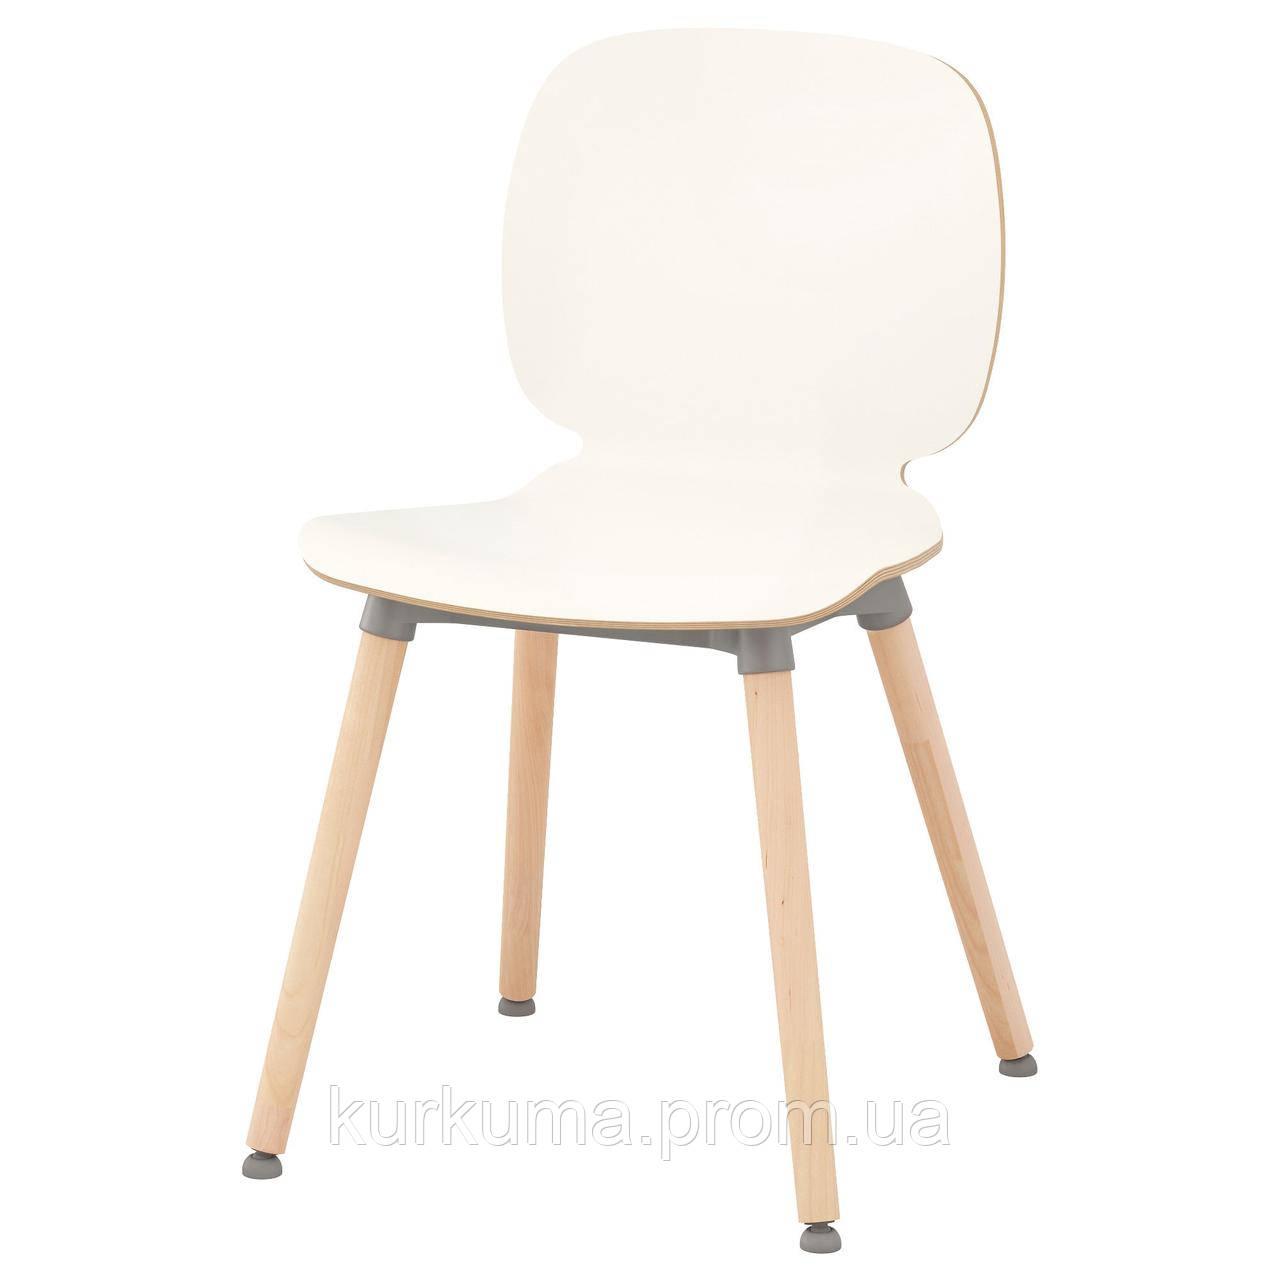 IKEA SVENBERTIL Стул, белый, Эрнфрид береза  (591.977.02)